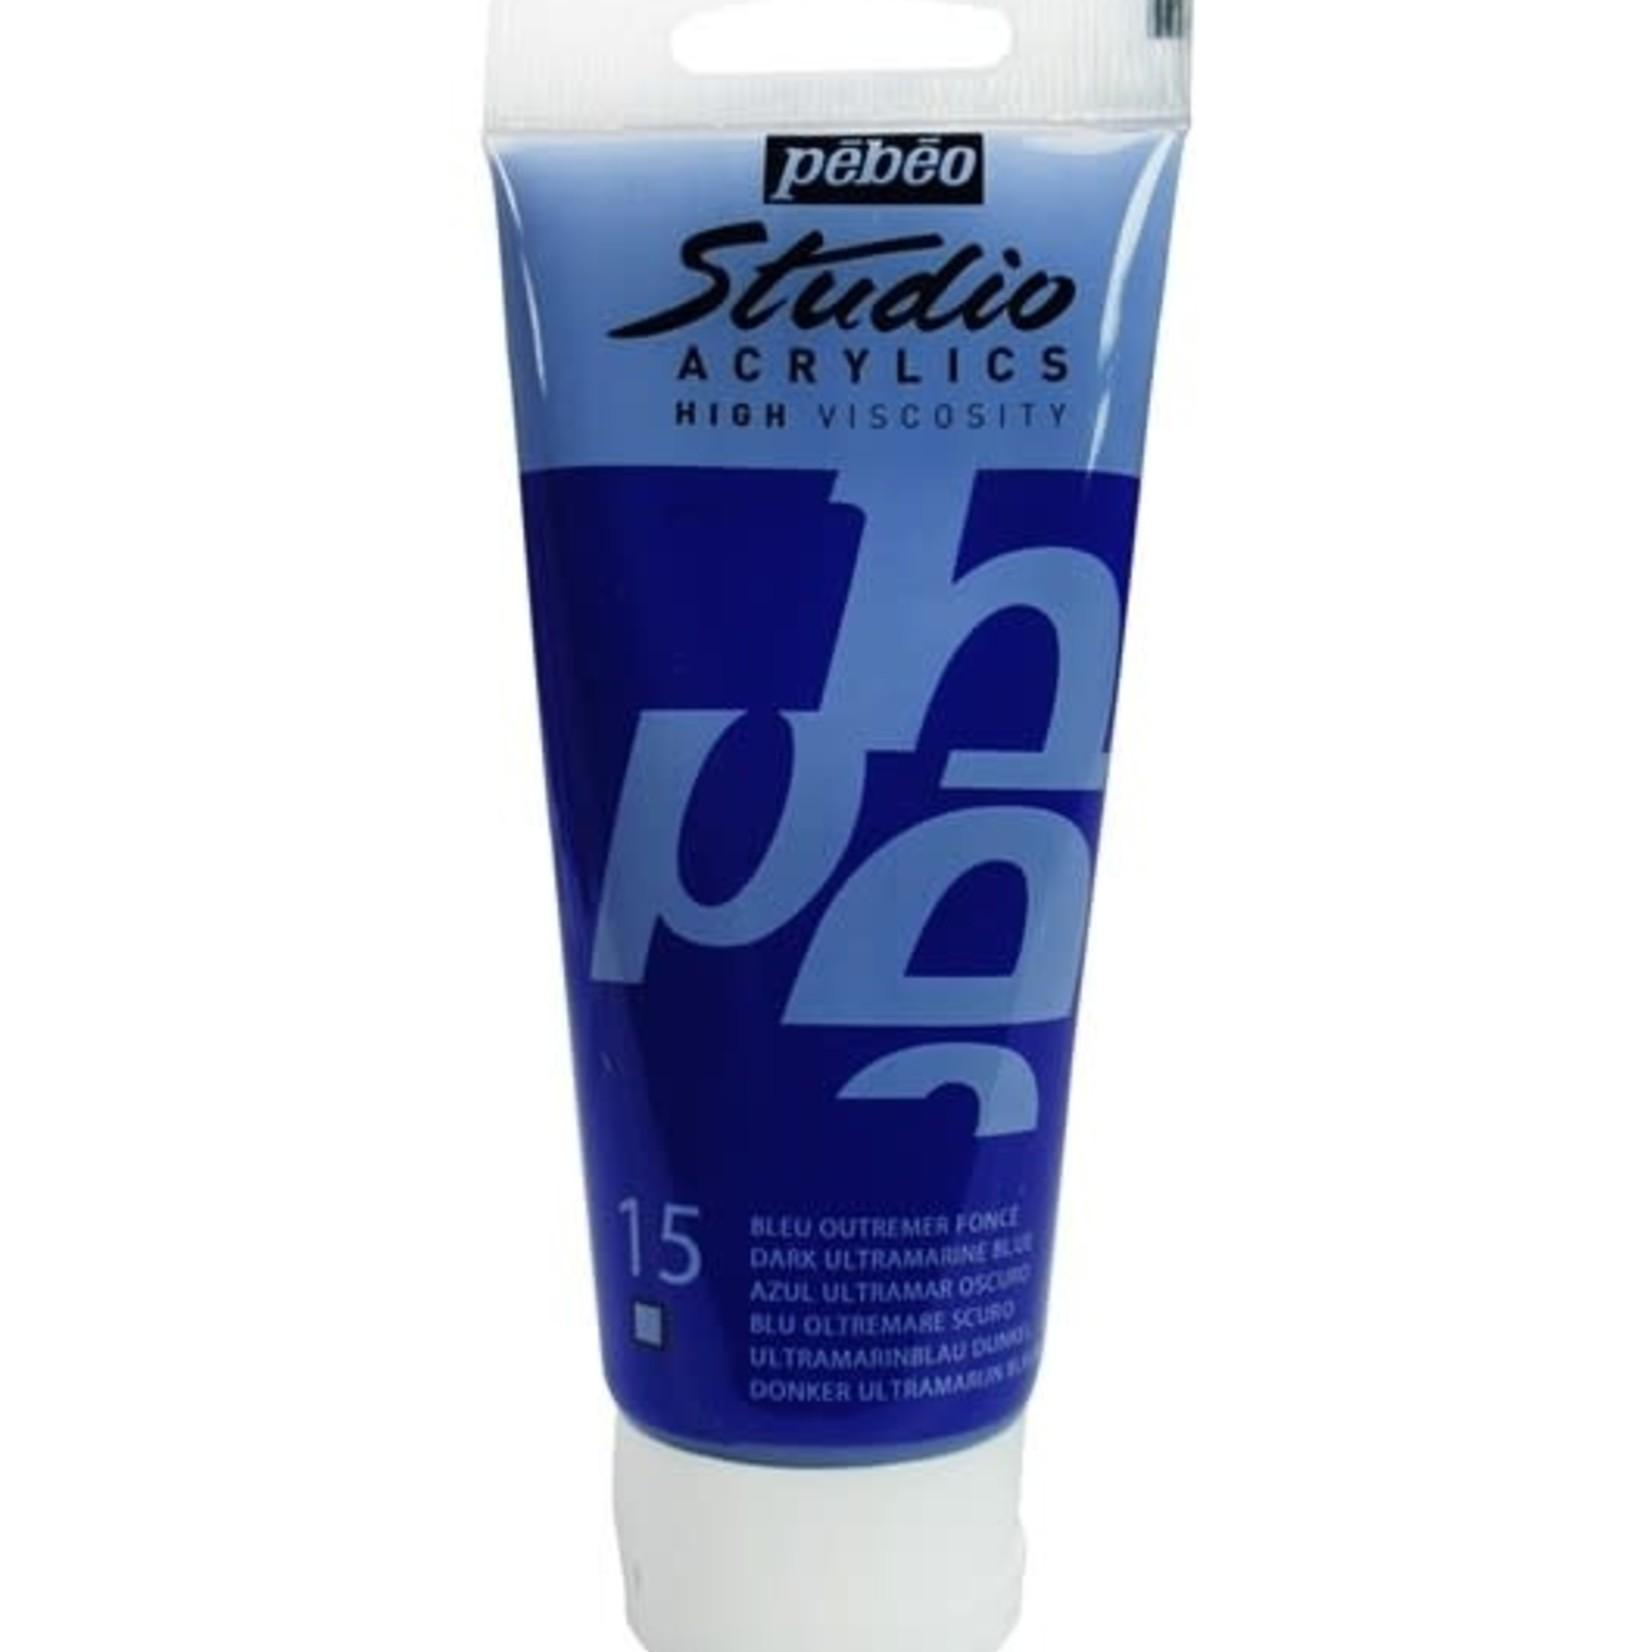 Pebeo Pebeo Acrylic Dark Ultramarine Blue Trans.